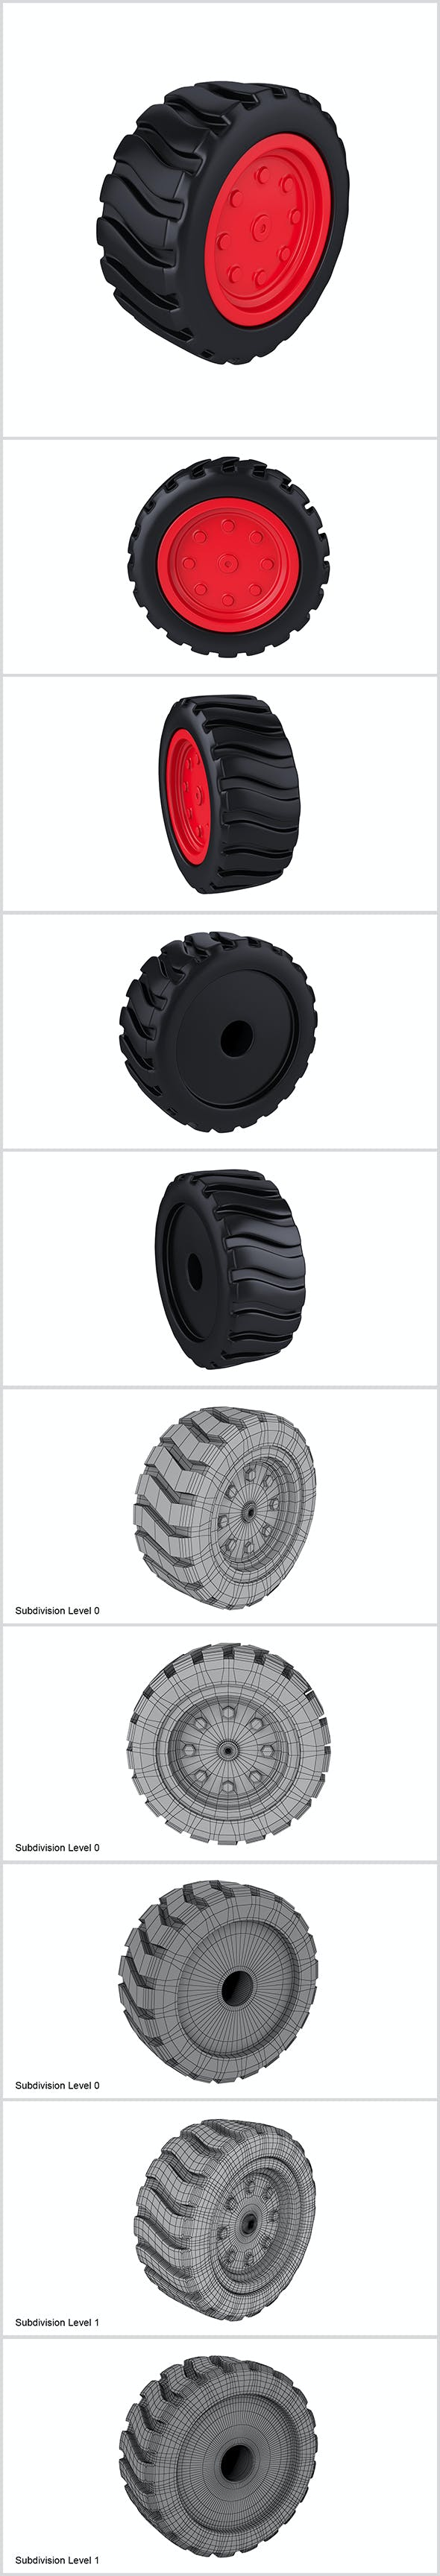 Cartoon wheel for toys - 3DOcean Item for Sale